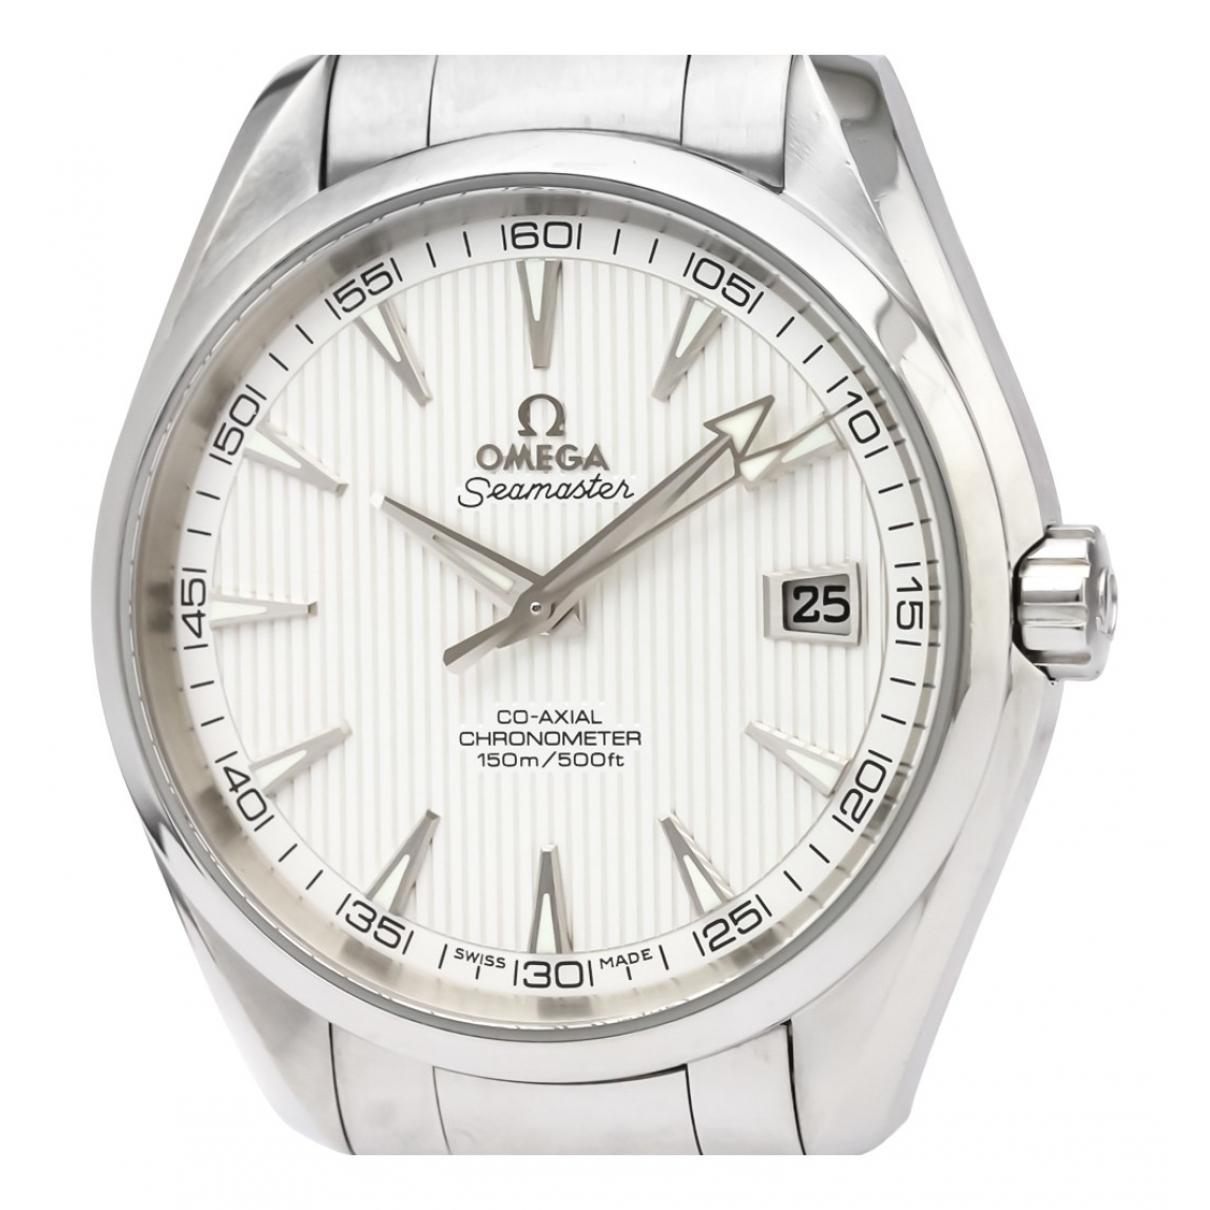 Omega Seamaster Aquaterra Uhr in  Silber Stahl